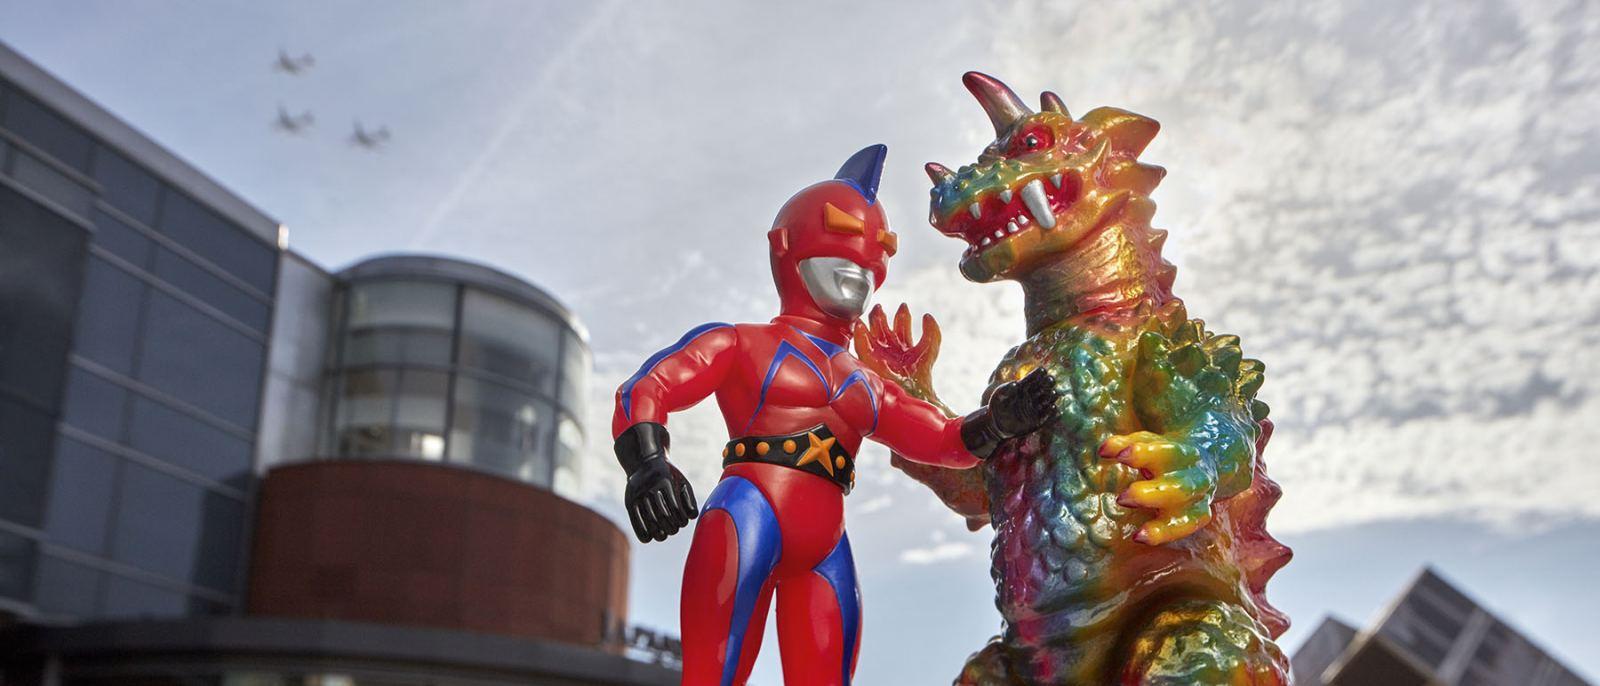 Kaiju vs Heroes JANM Japanese American National Museum